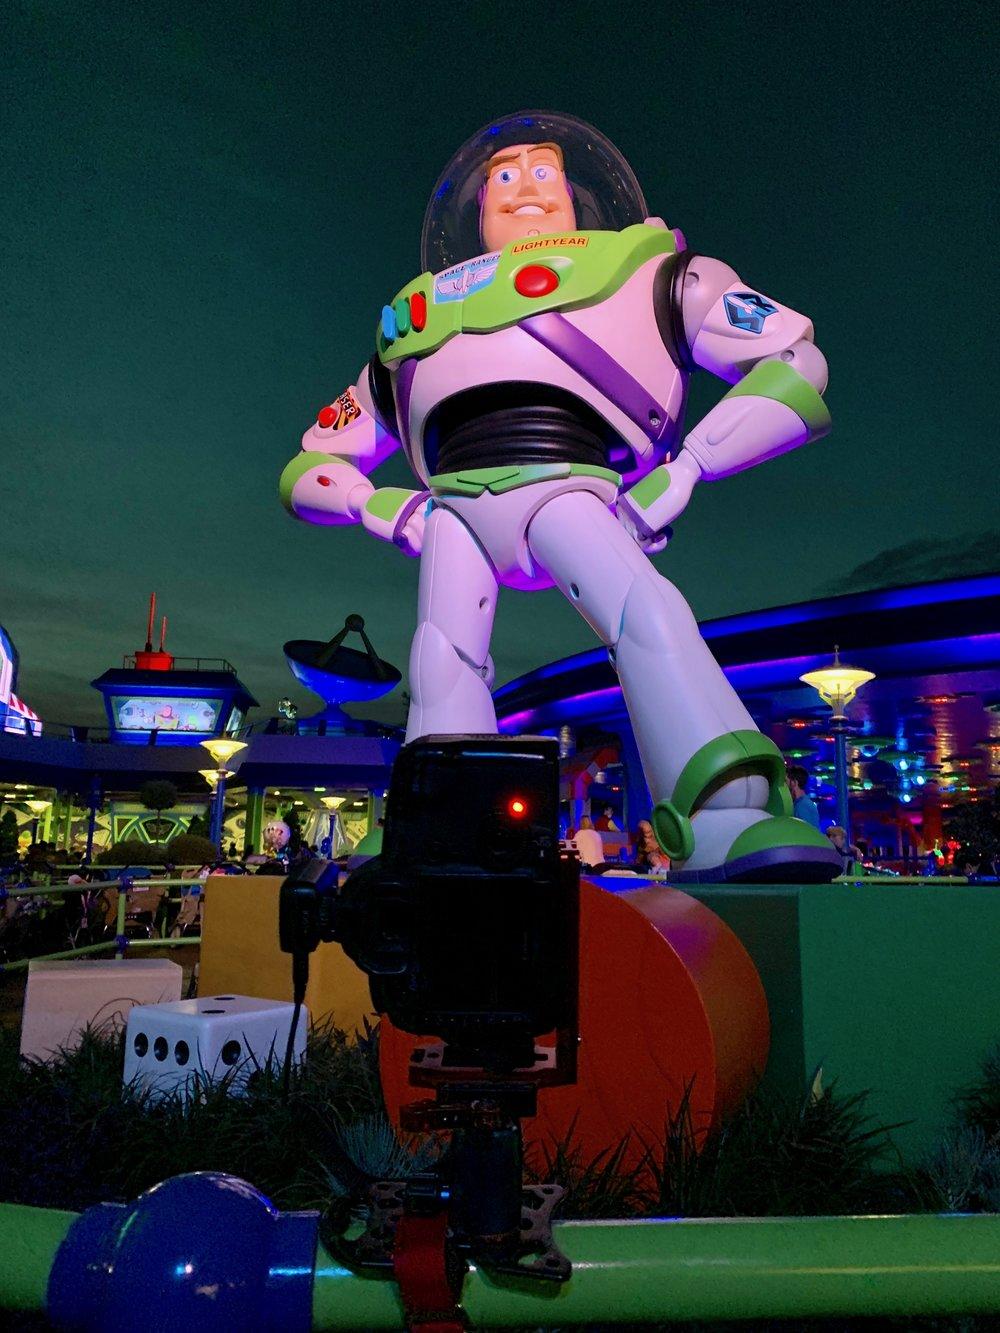 Platypod Ultra and Buzz Lightyear